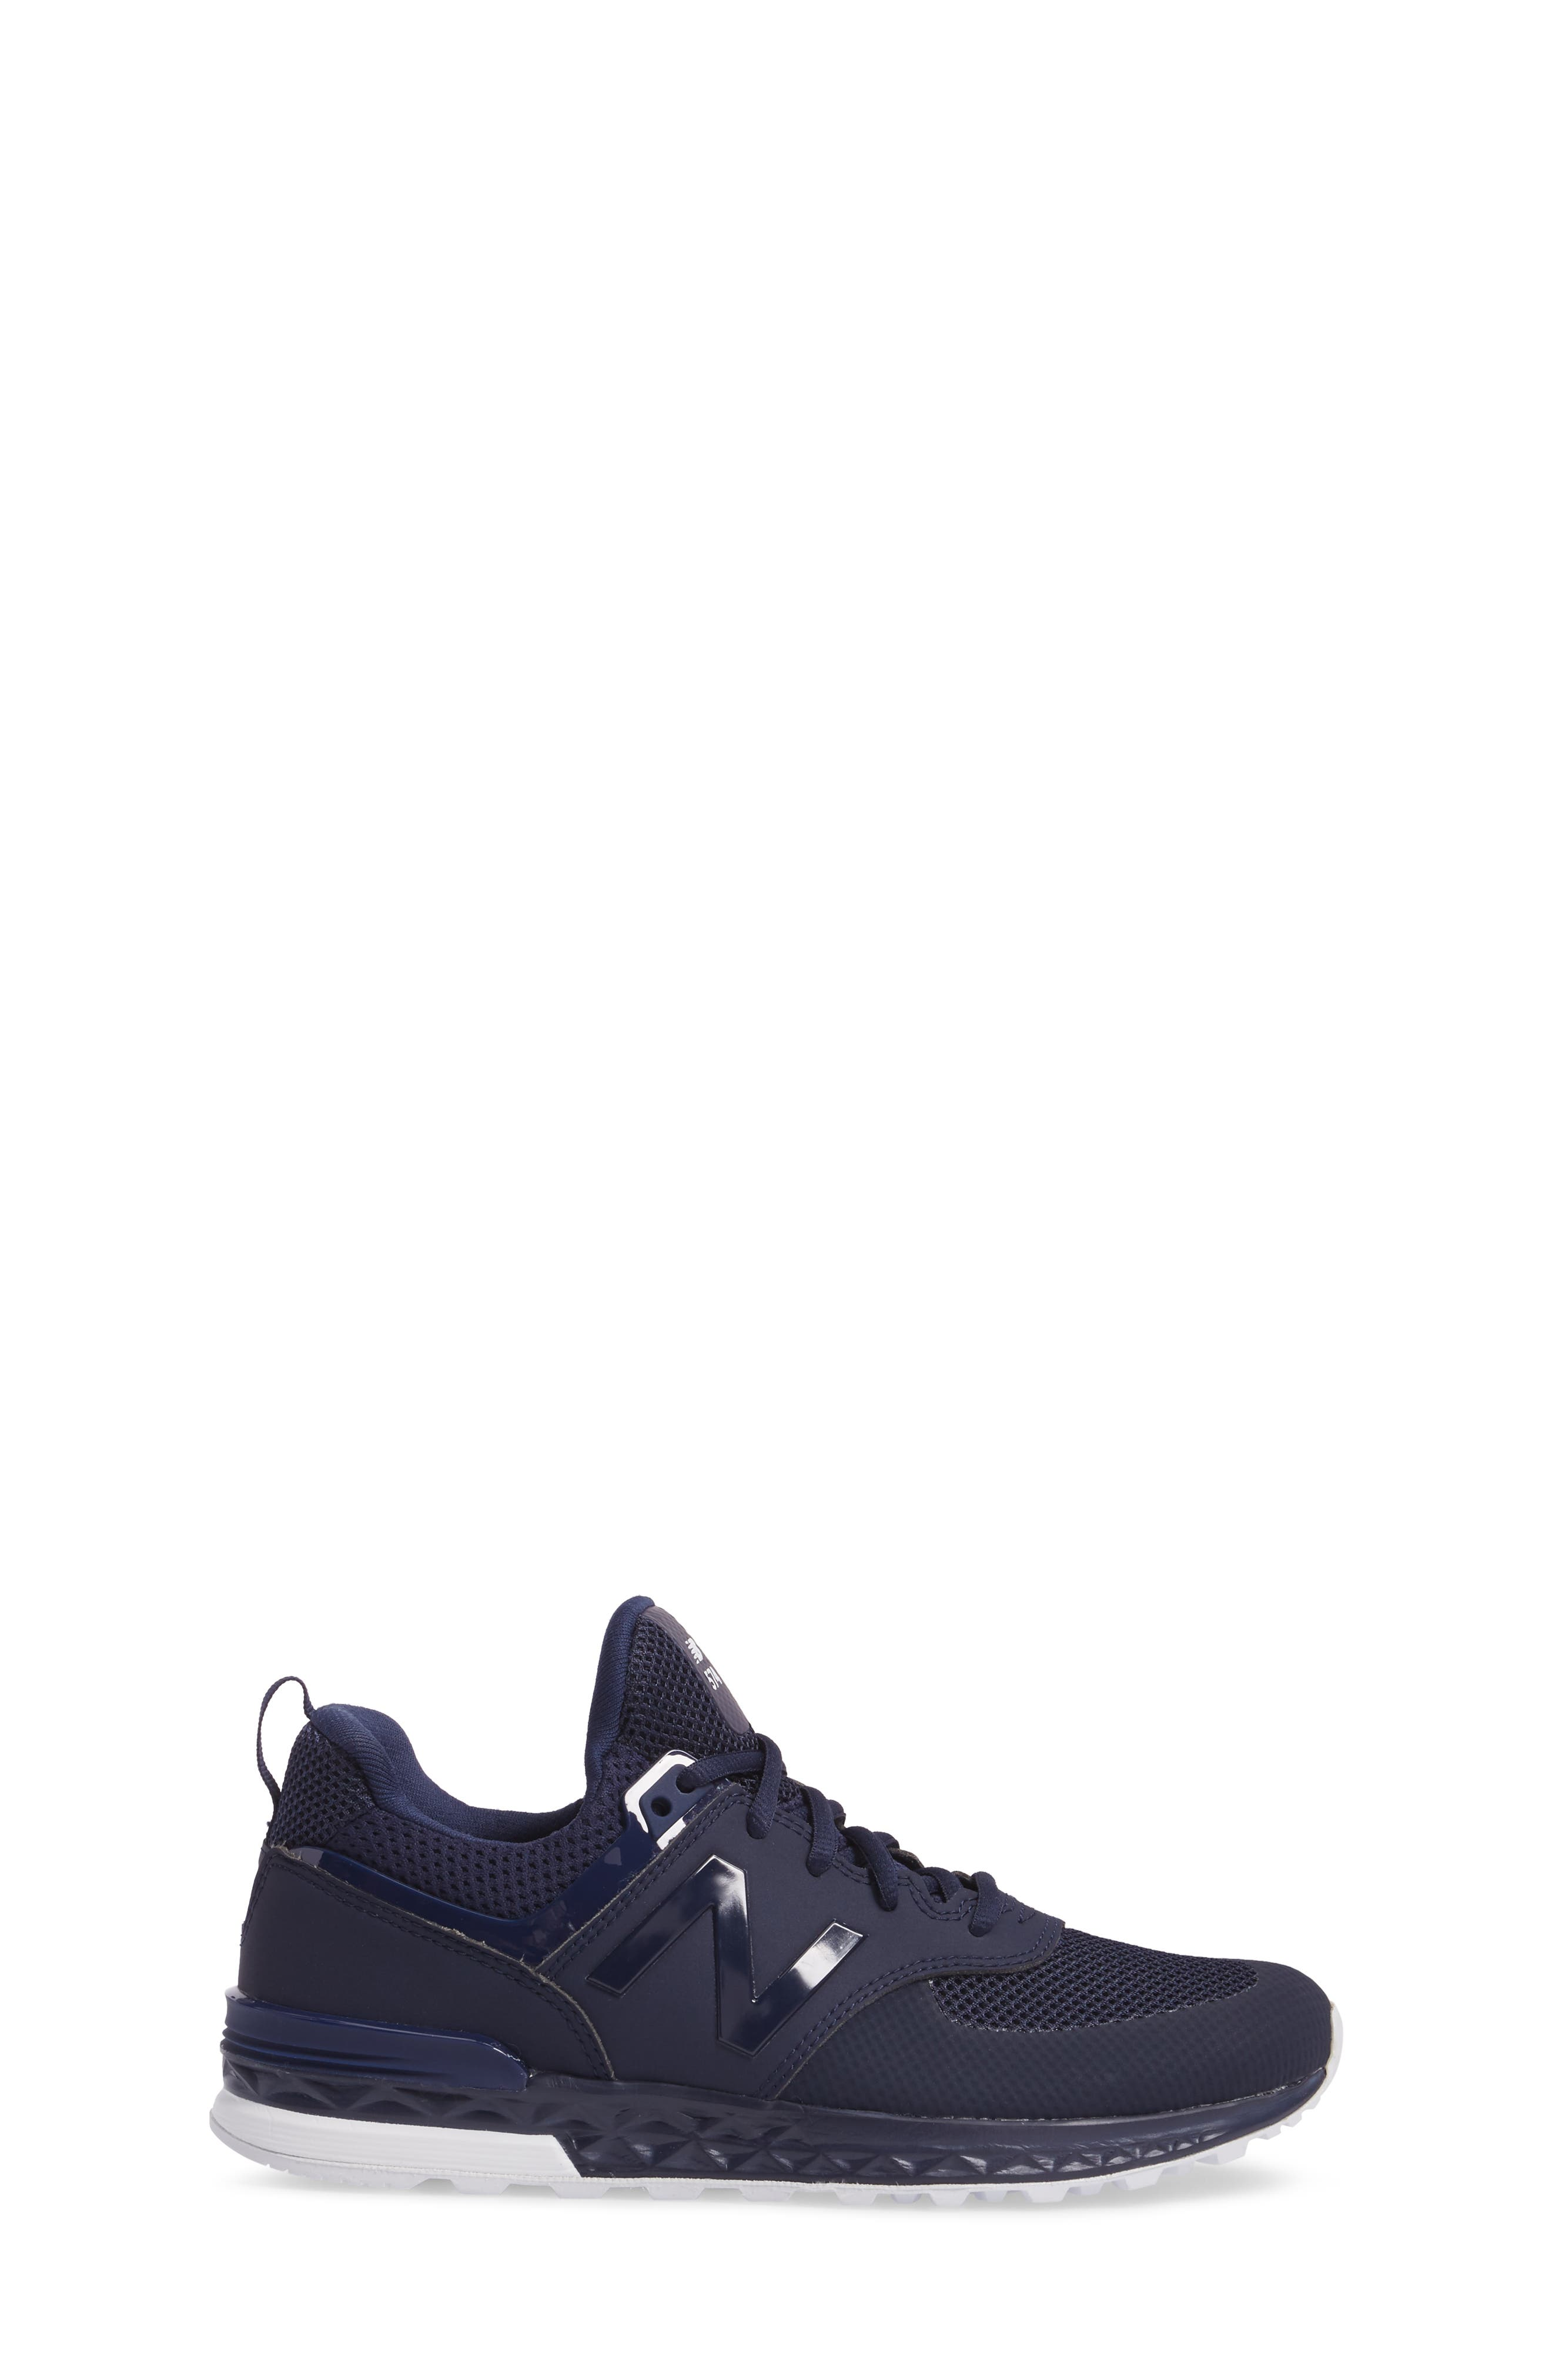 Alternate Image 3  - New Balance 574 Sport Sneaker (Baby, Walker, Toddler, Little Kid & Big Kid)